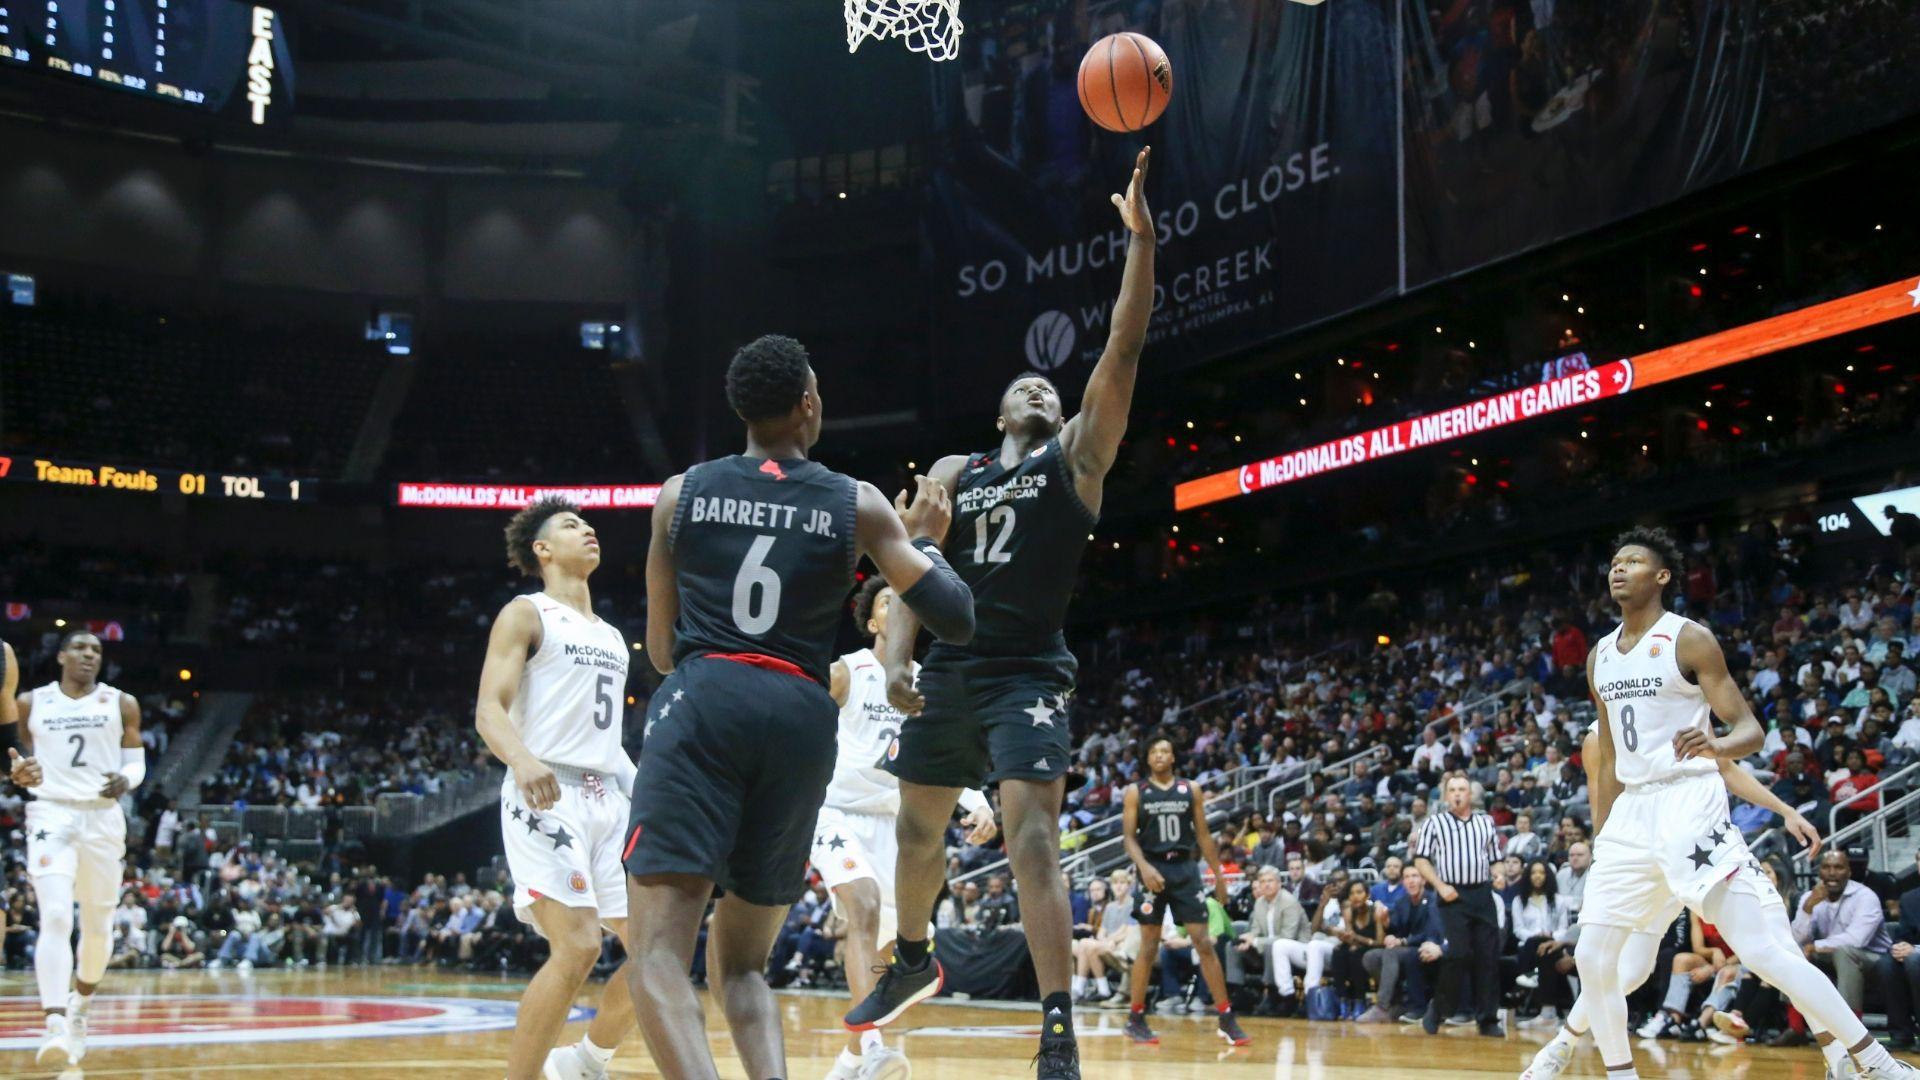 Duke's future shines at All-American Game